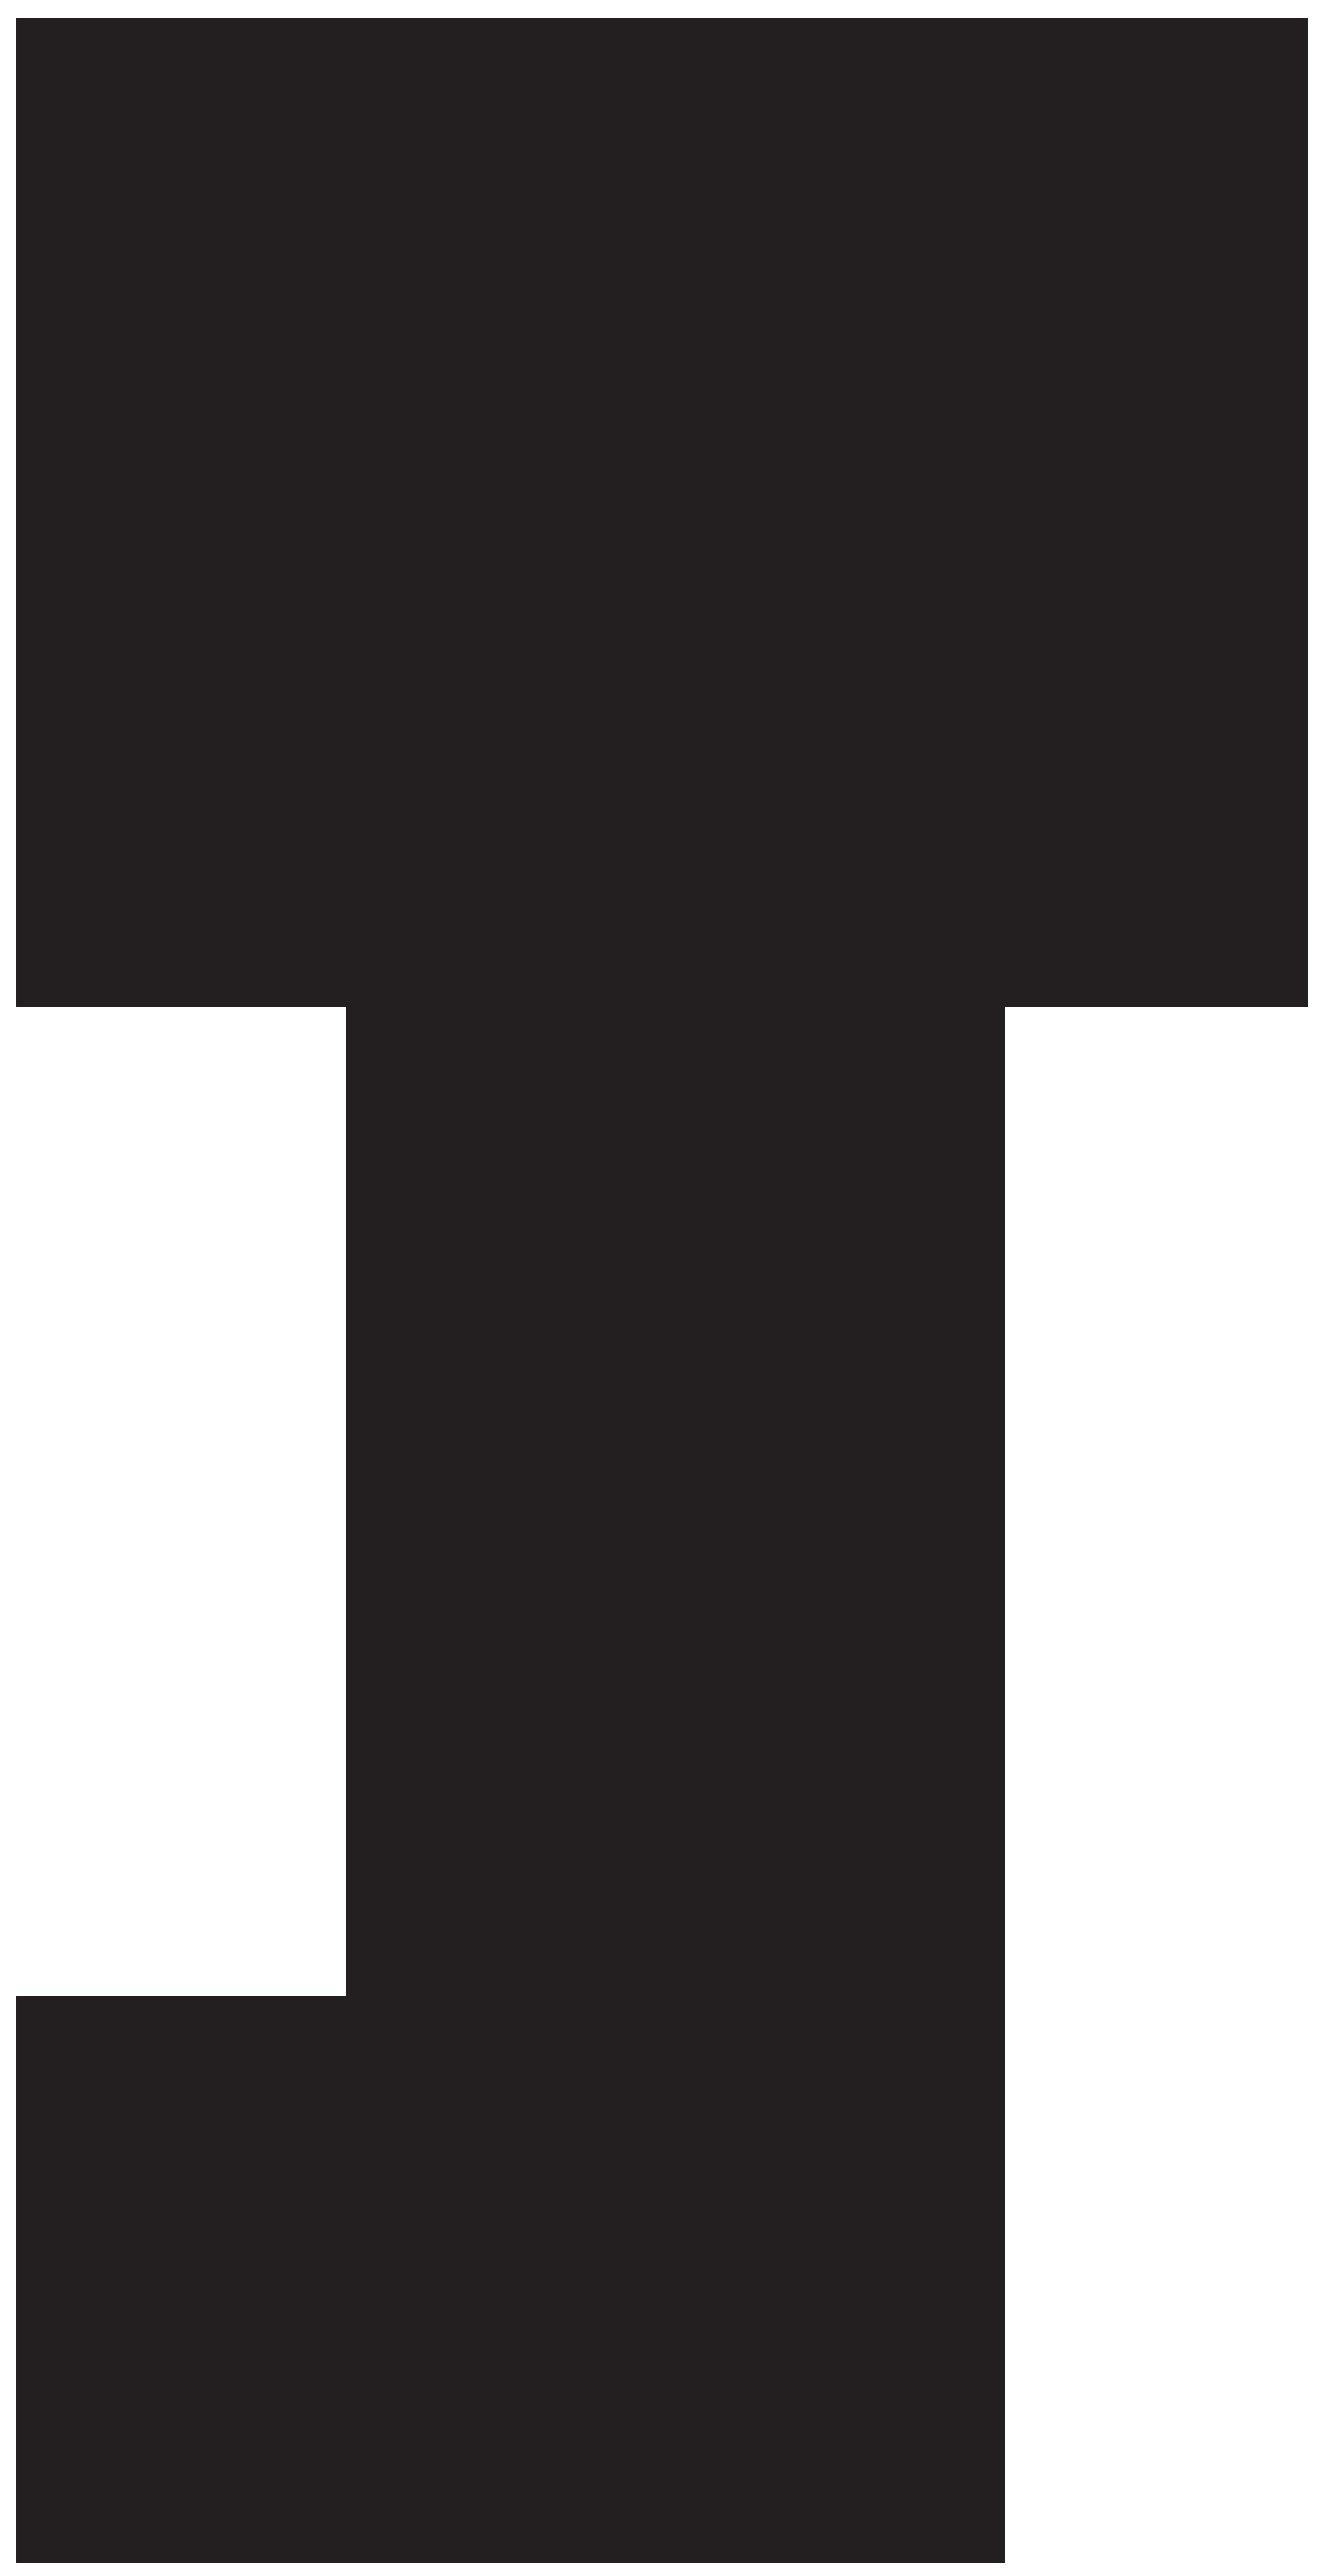 4147x8000 Man With Hands Up Silhouette Clip Art Imageu200b Gallery